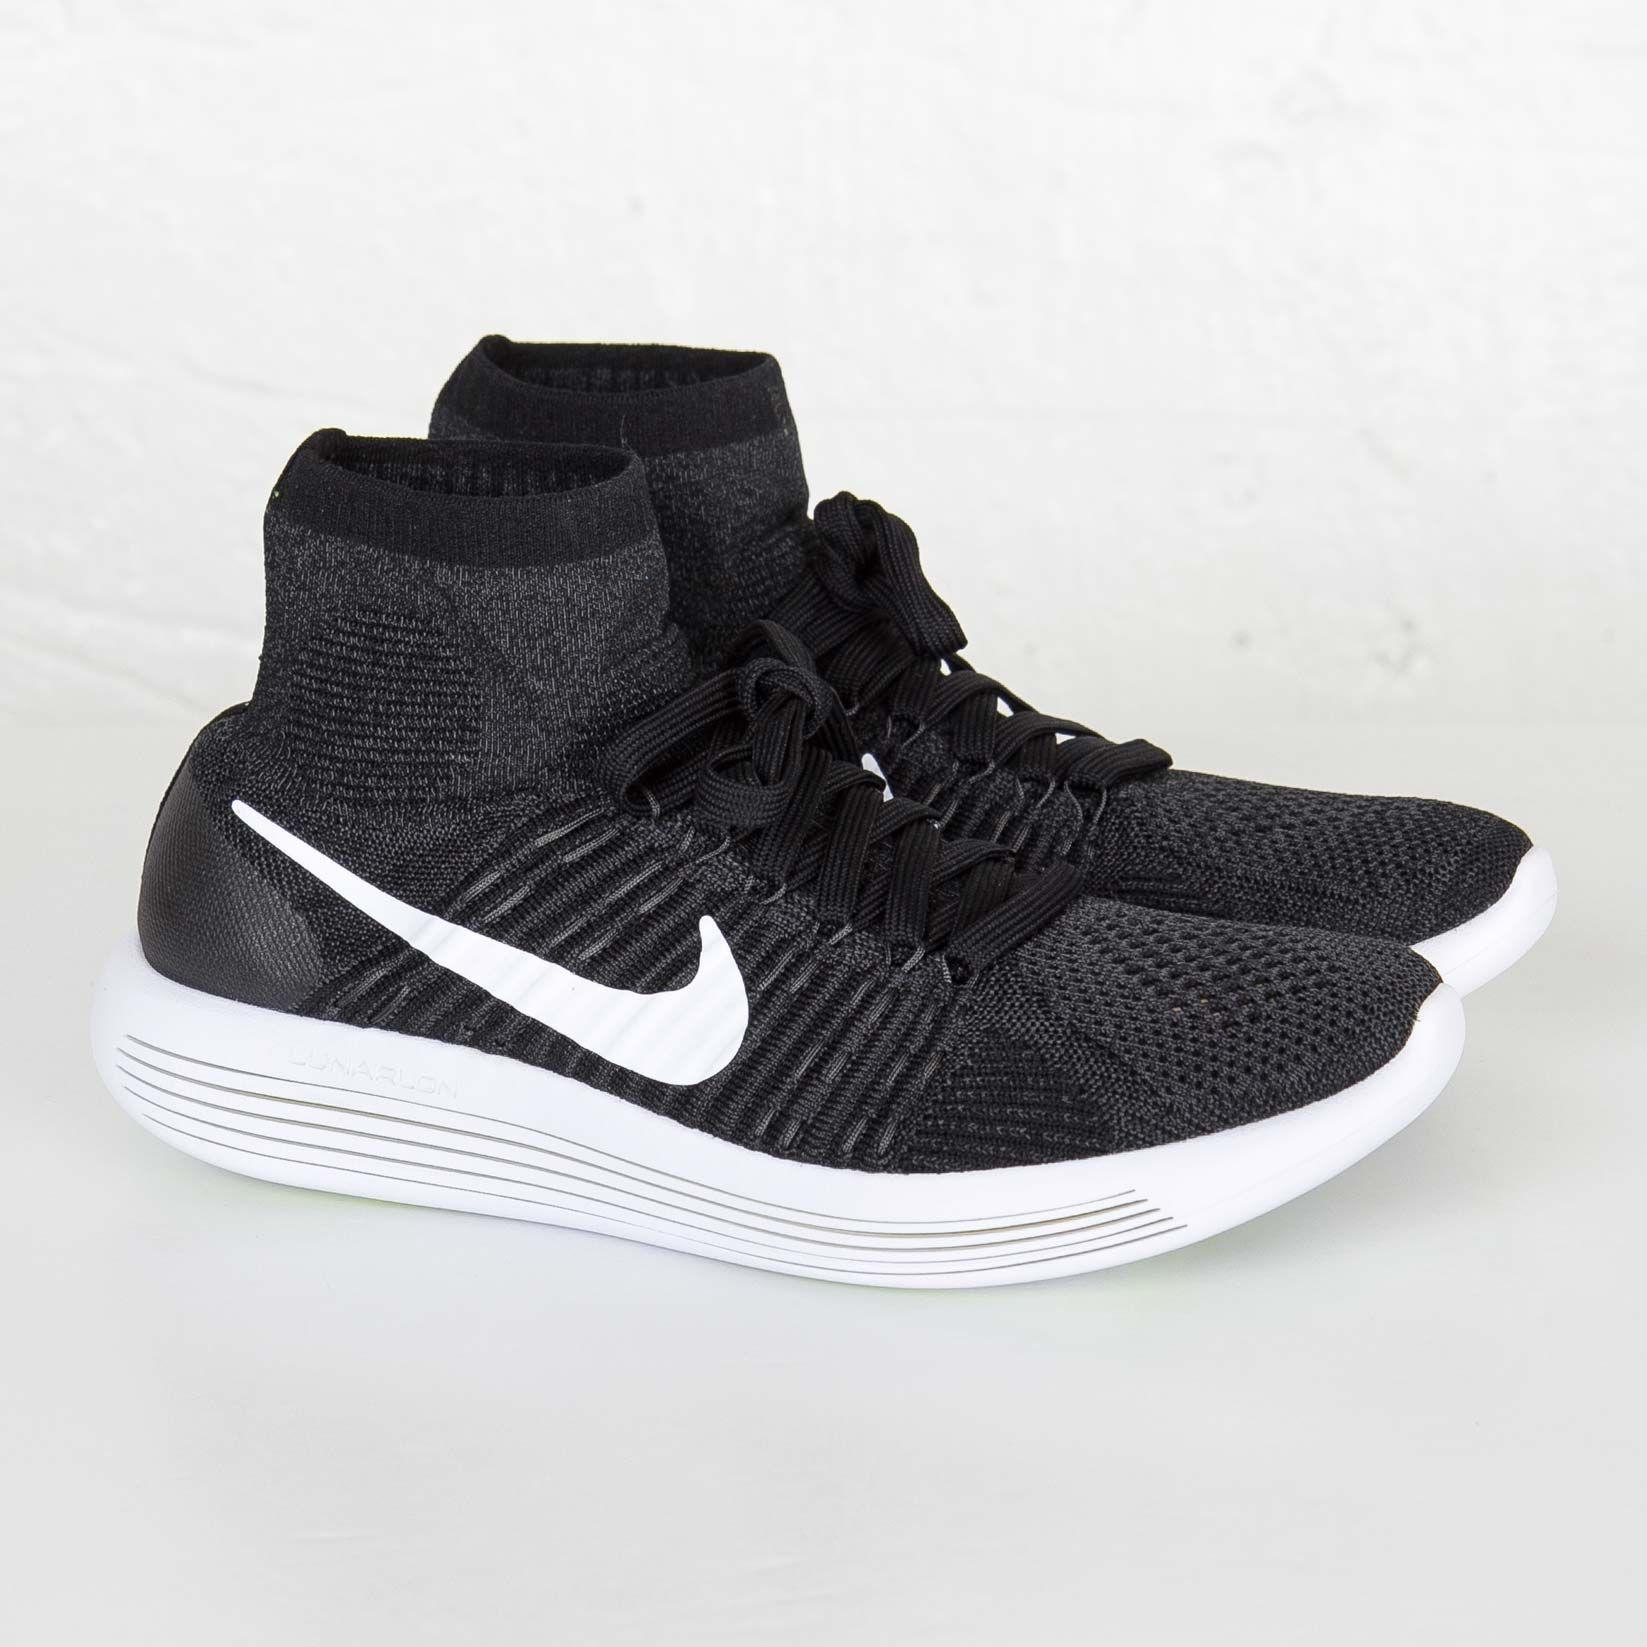 a85b87612aba8 Nike Lunarepic Flyknit